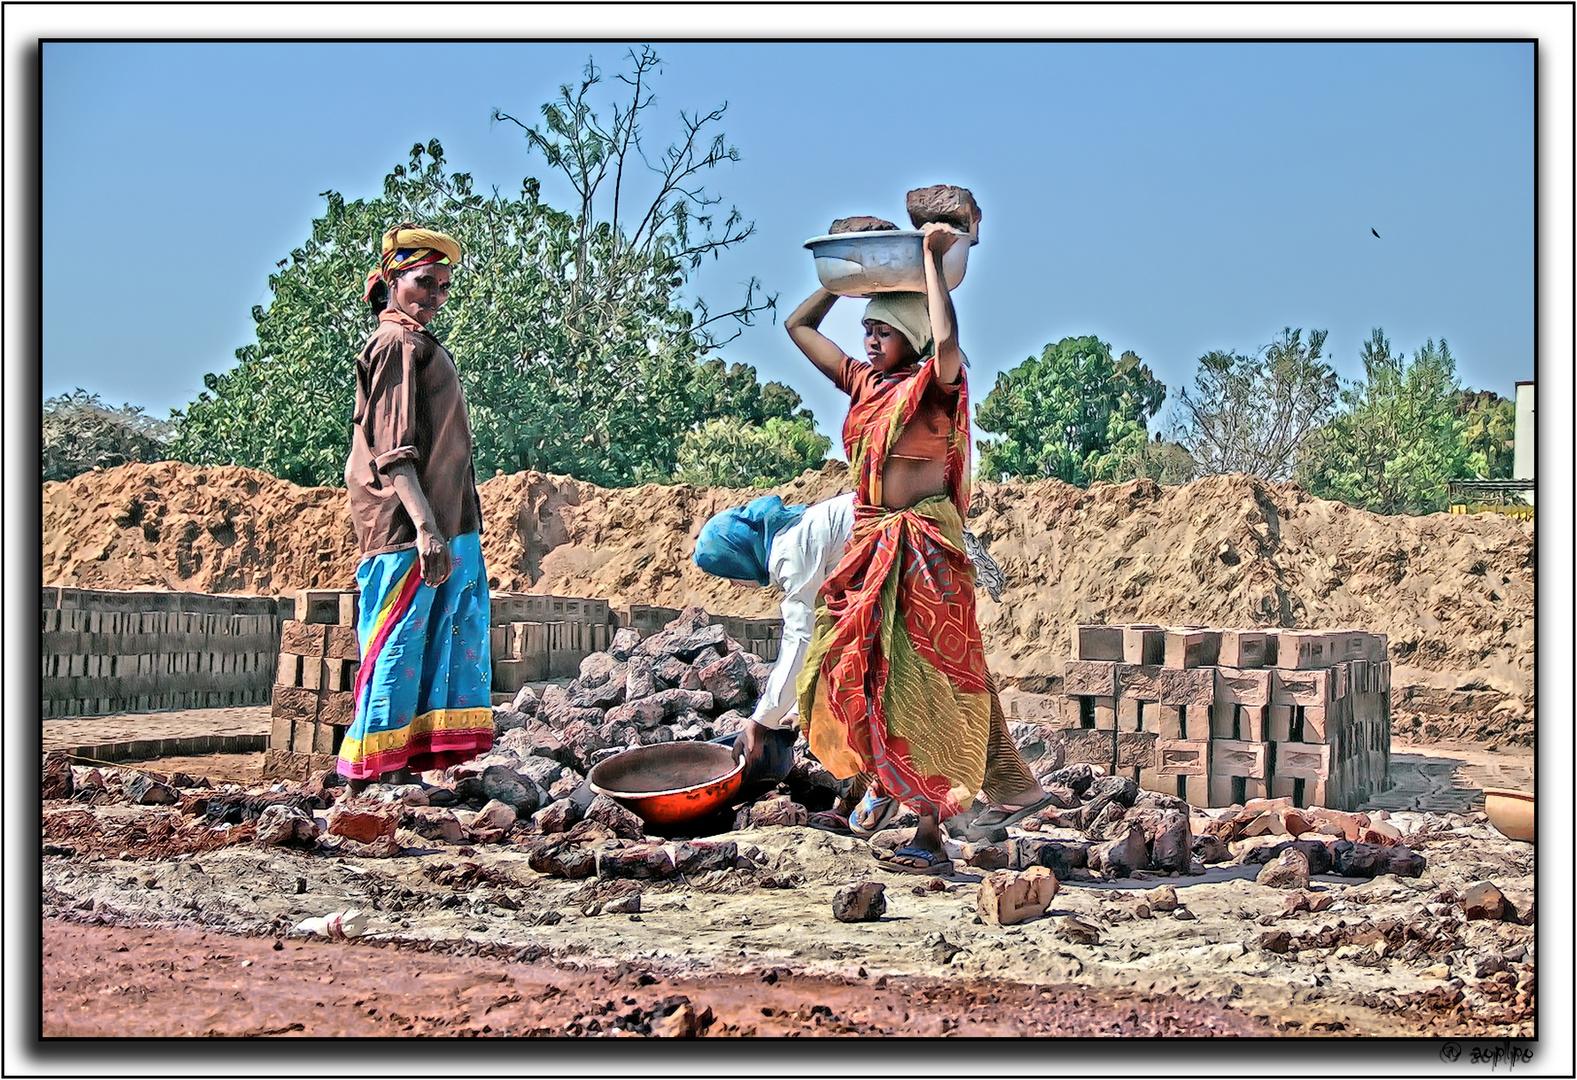 Mujeres - Trabajos (1)